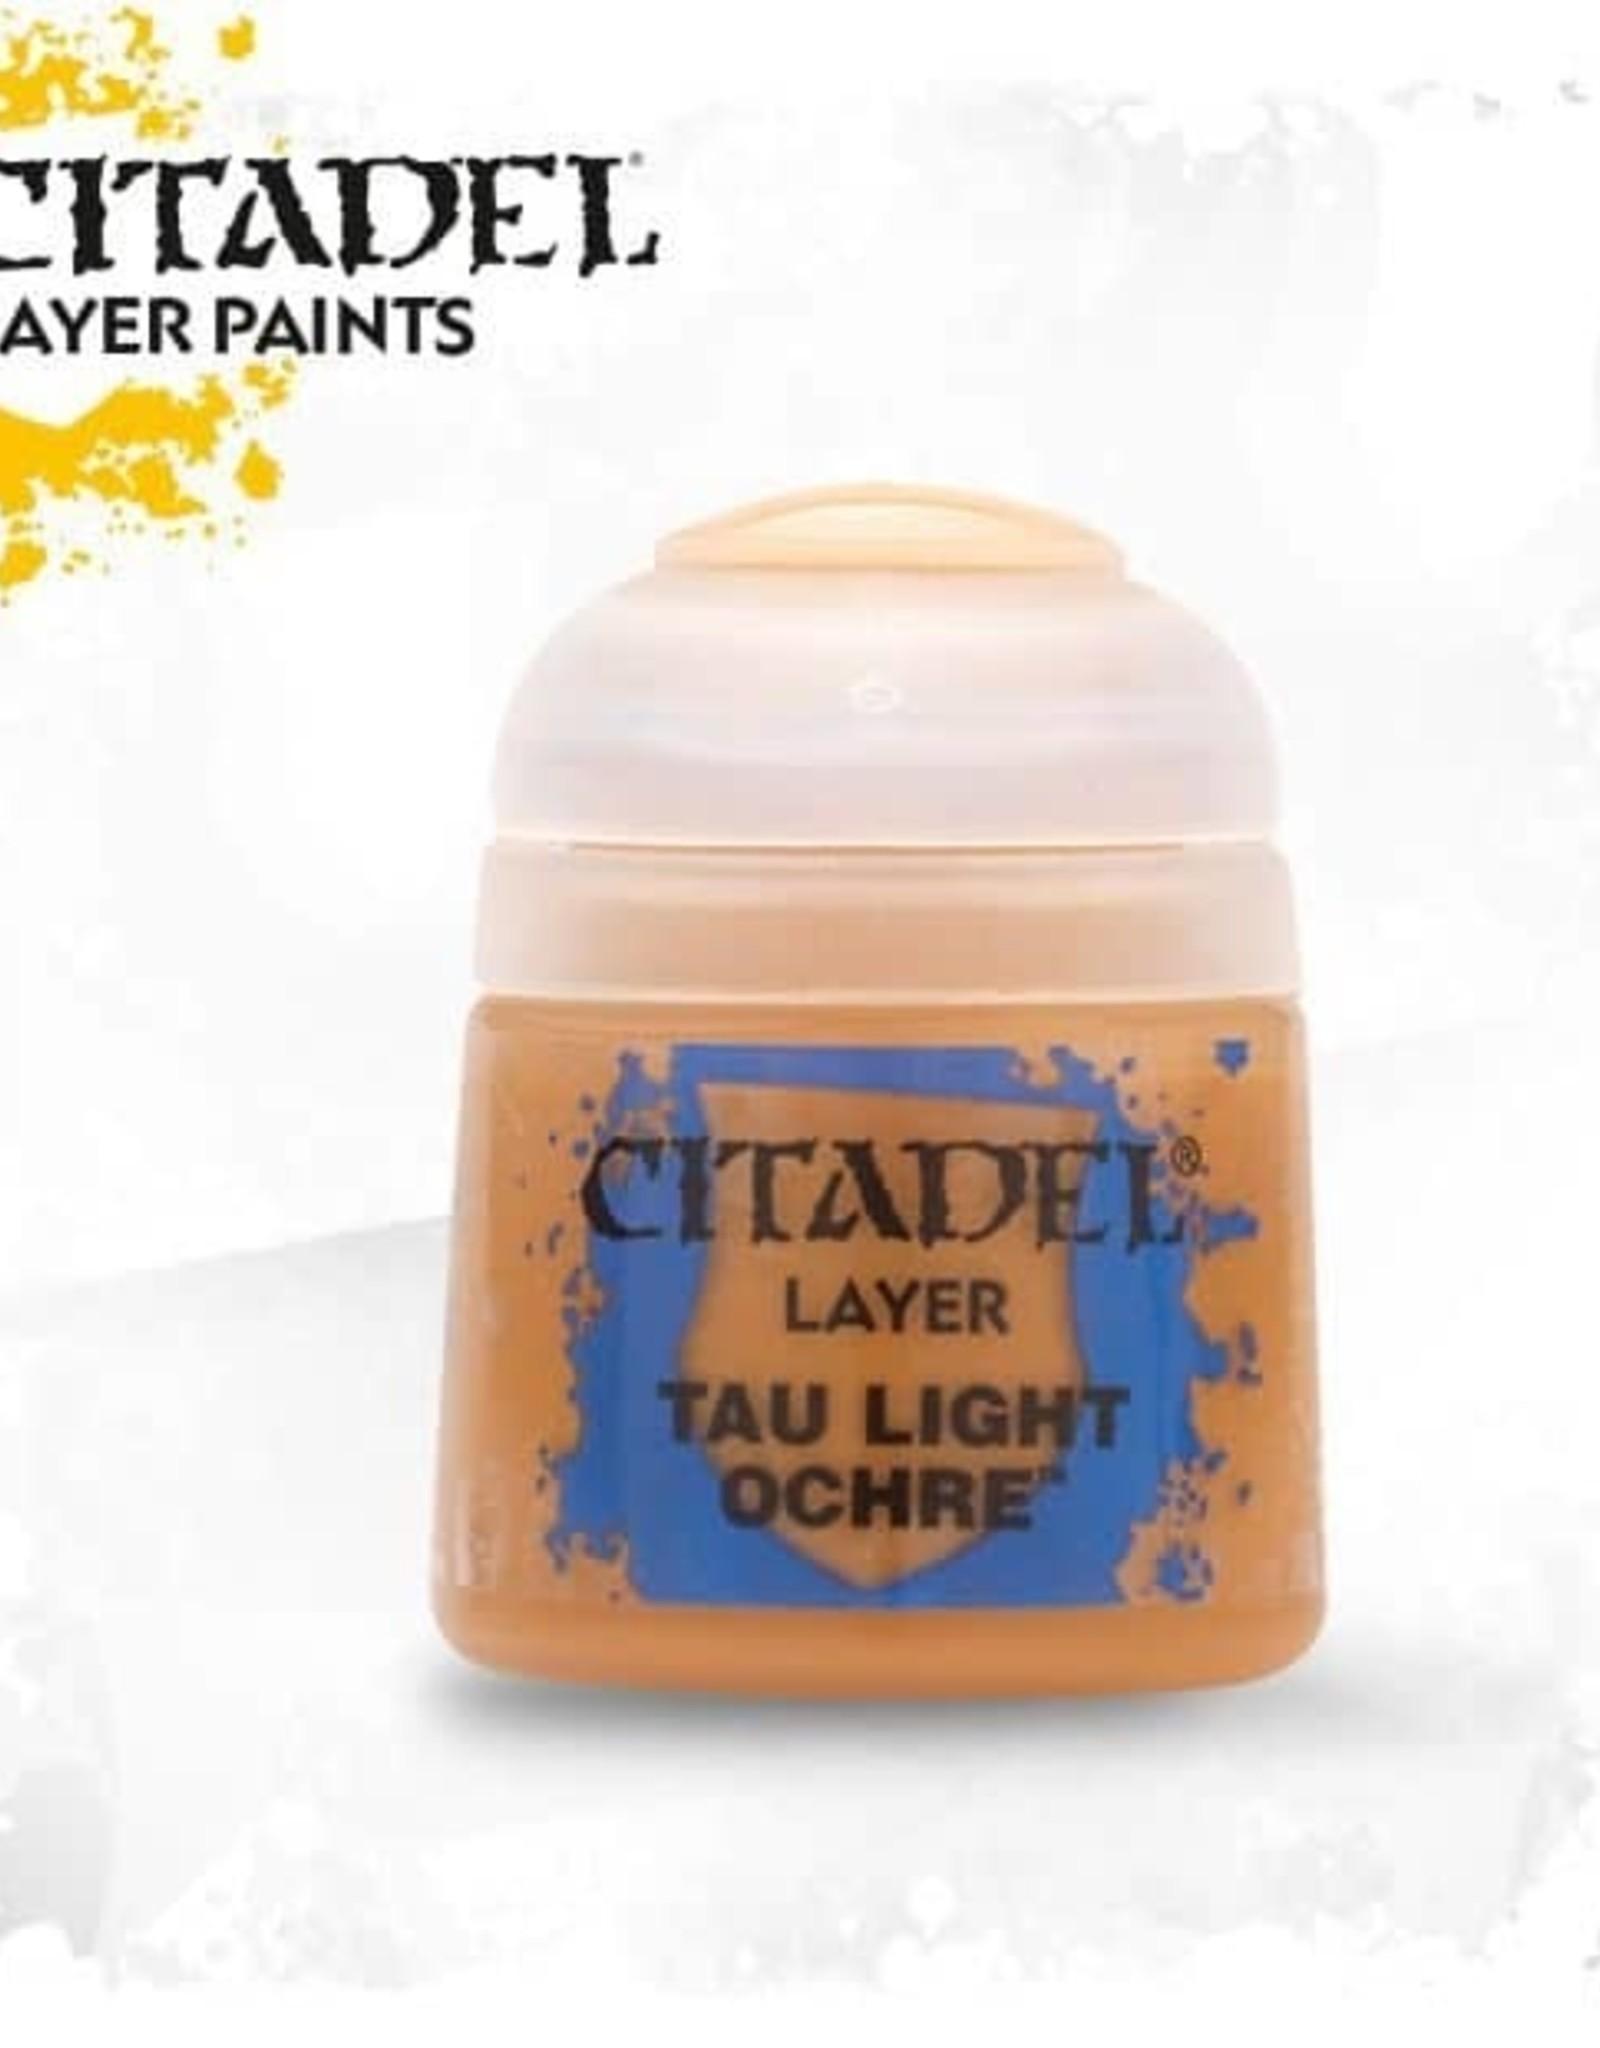 Games Workshop Citadel Paint: Layer - Tau Light Ochre